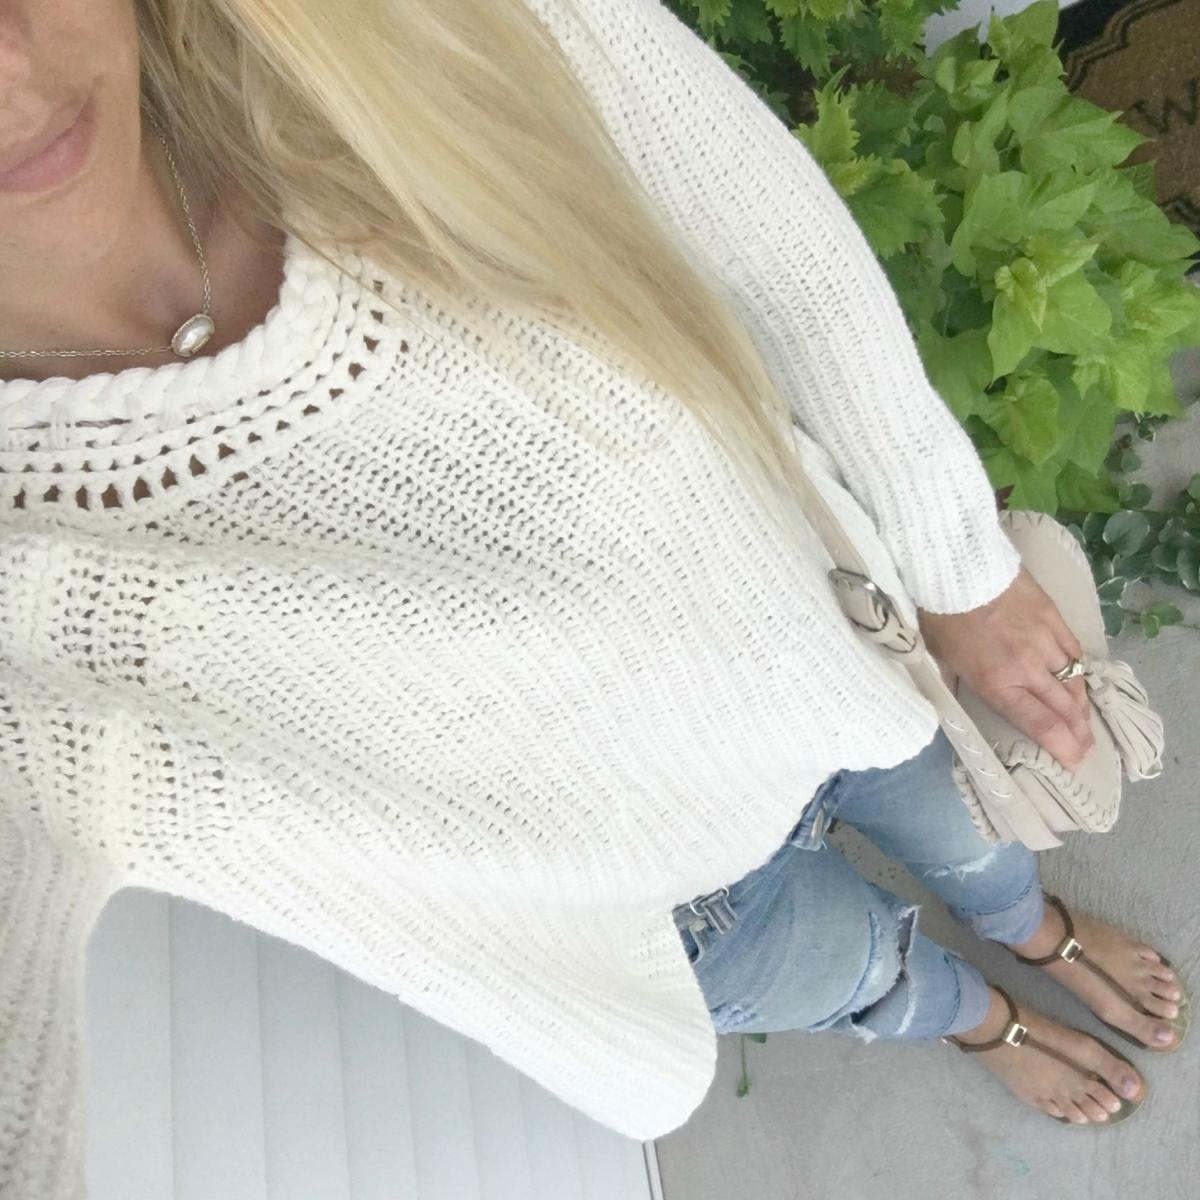 Cozy oversized sweater and destroyed denim |www.pearlsandsportsbras.com|